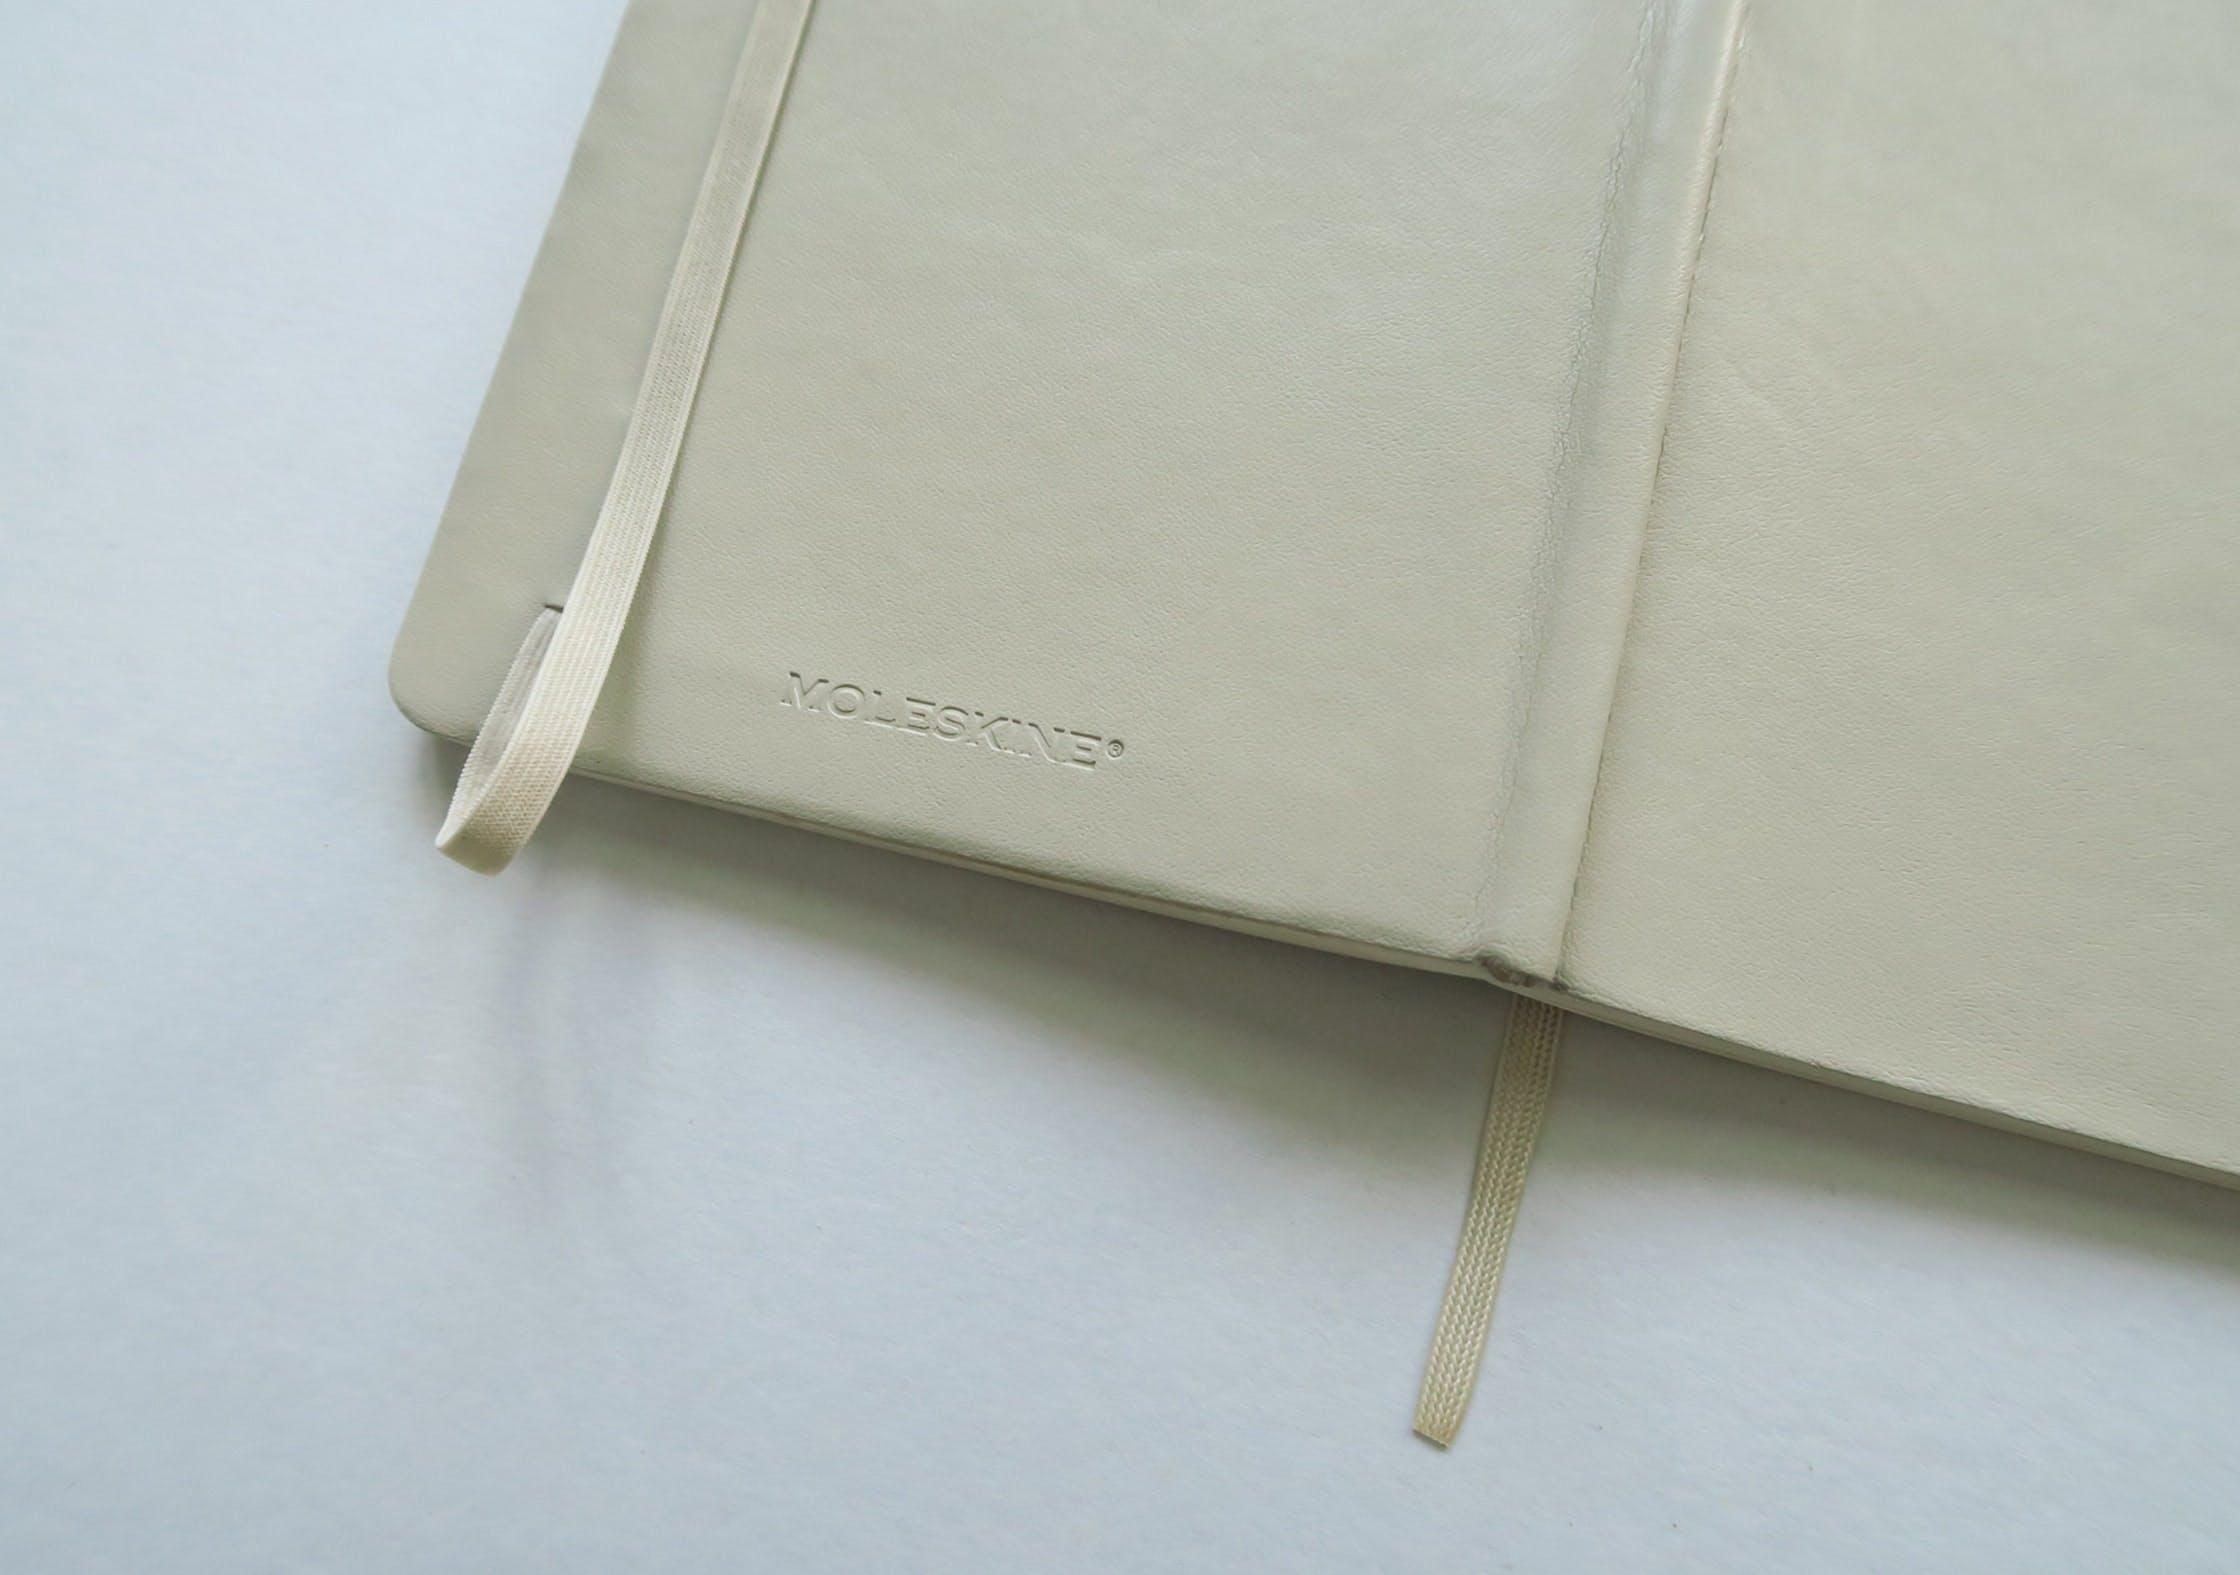 Moleskine Large Dot Grid Soft Cover Notebook Back Cover